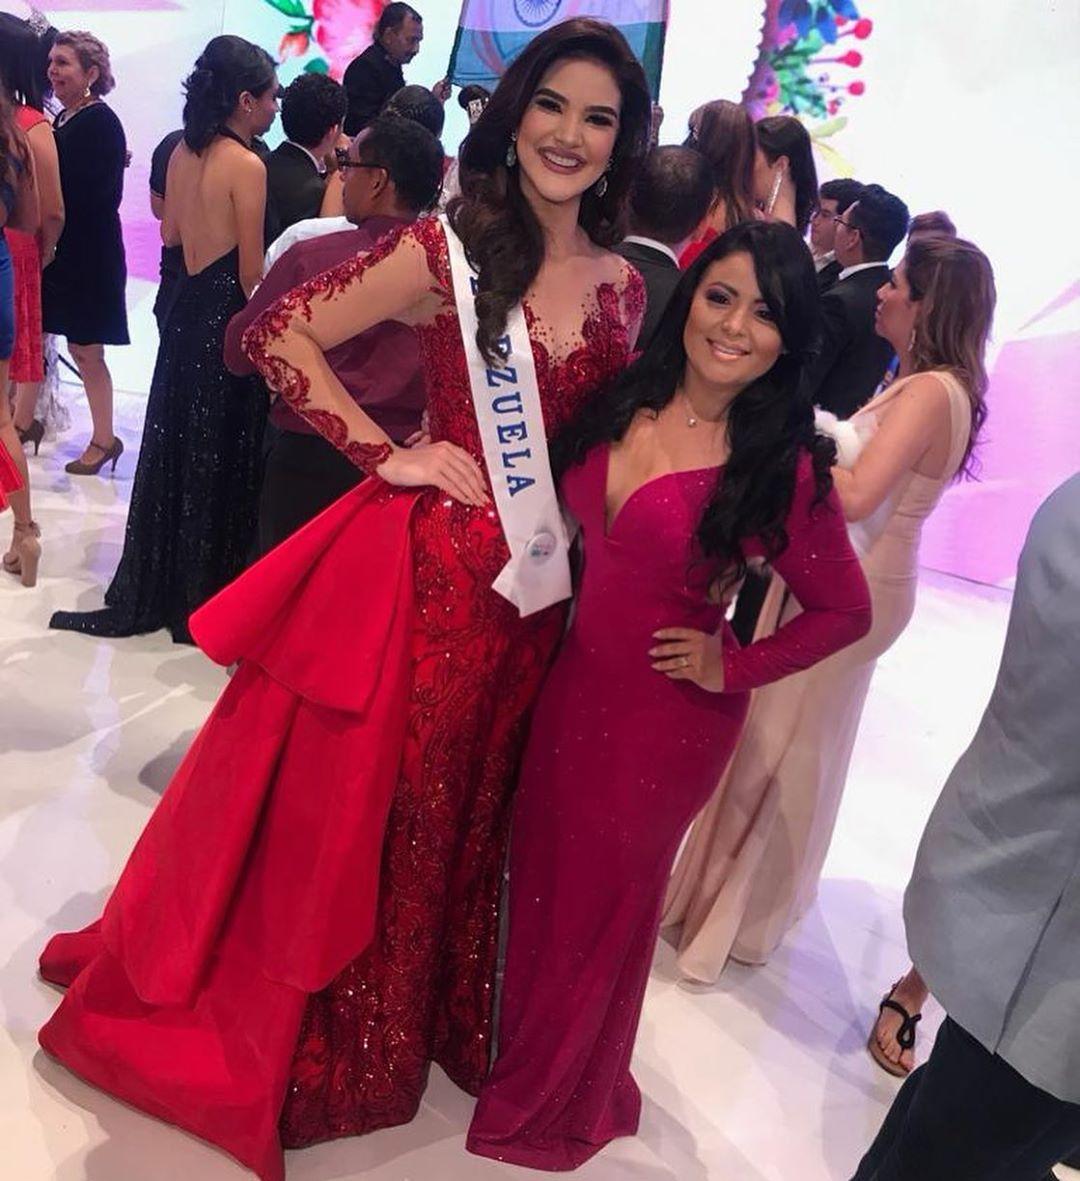 daniela di venere, top 12 de miss teen mundial 2019. - Página 7 60045110